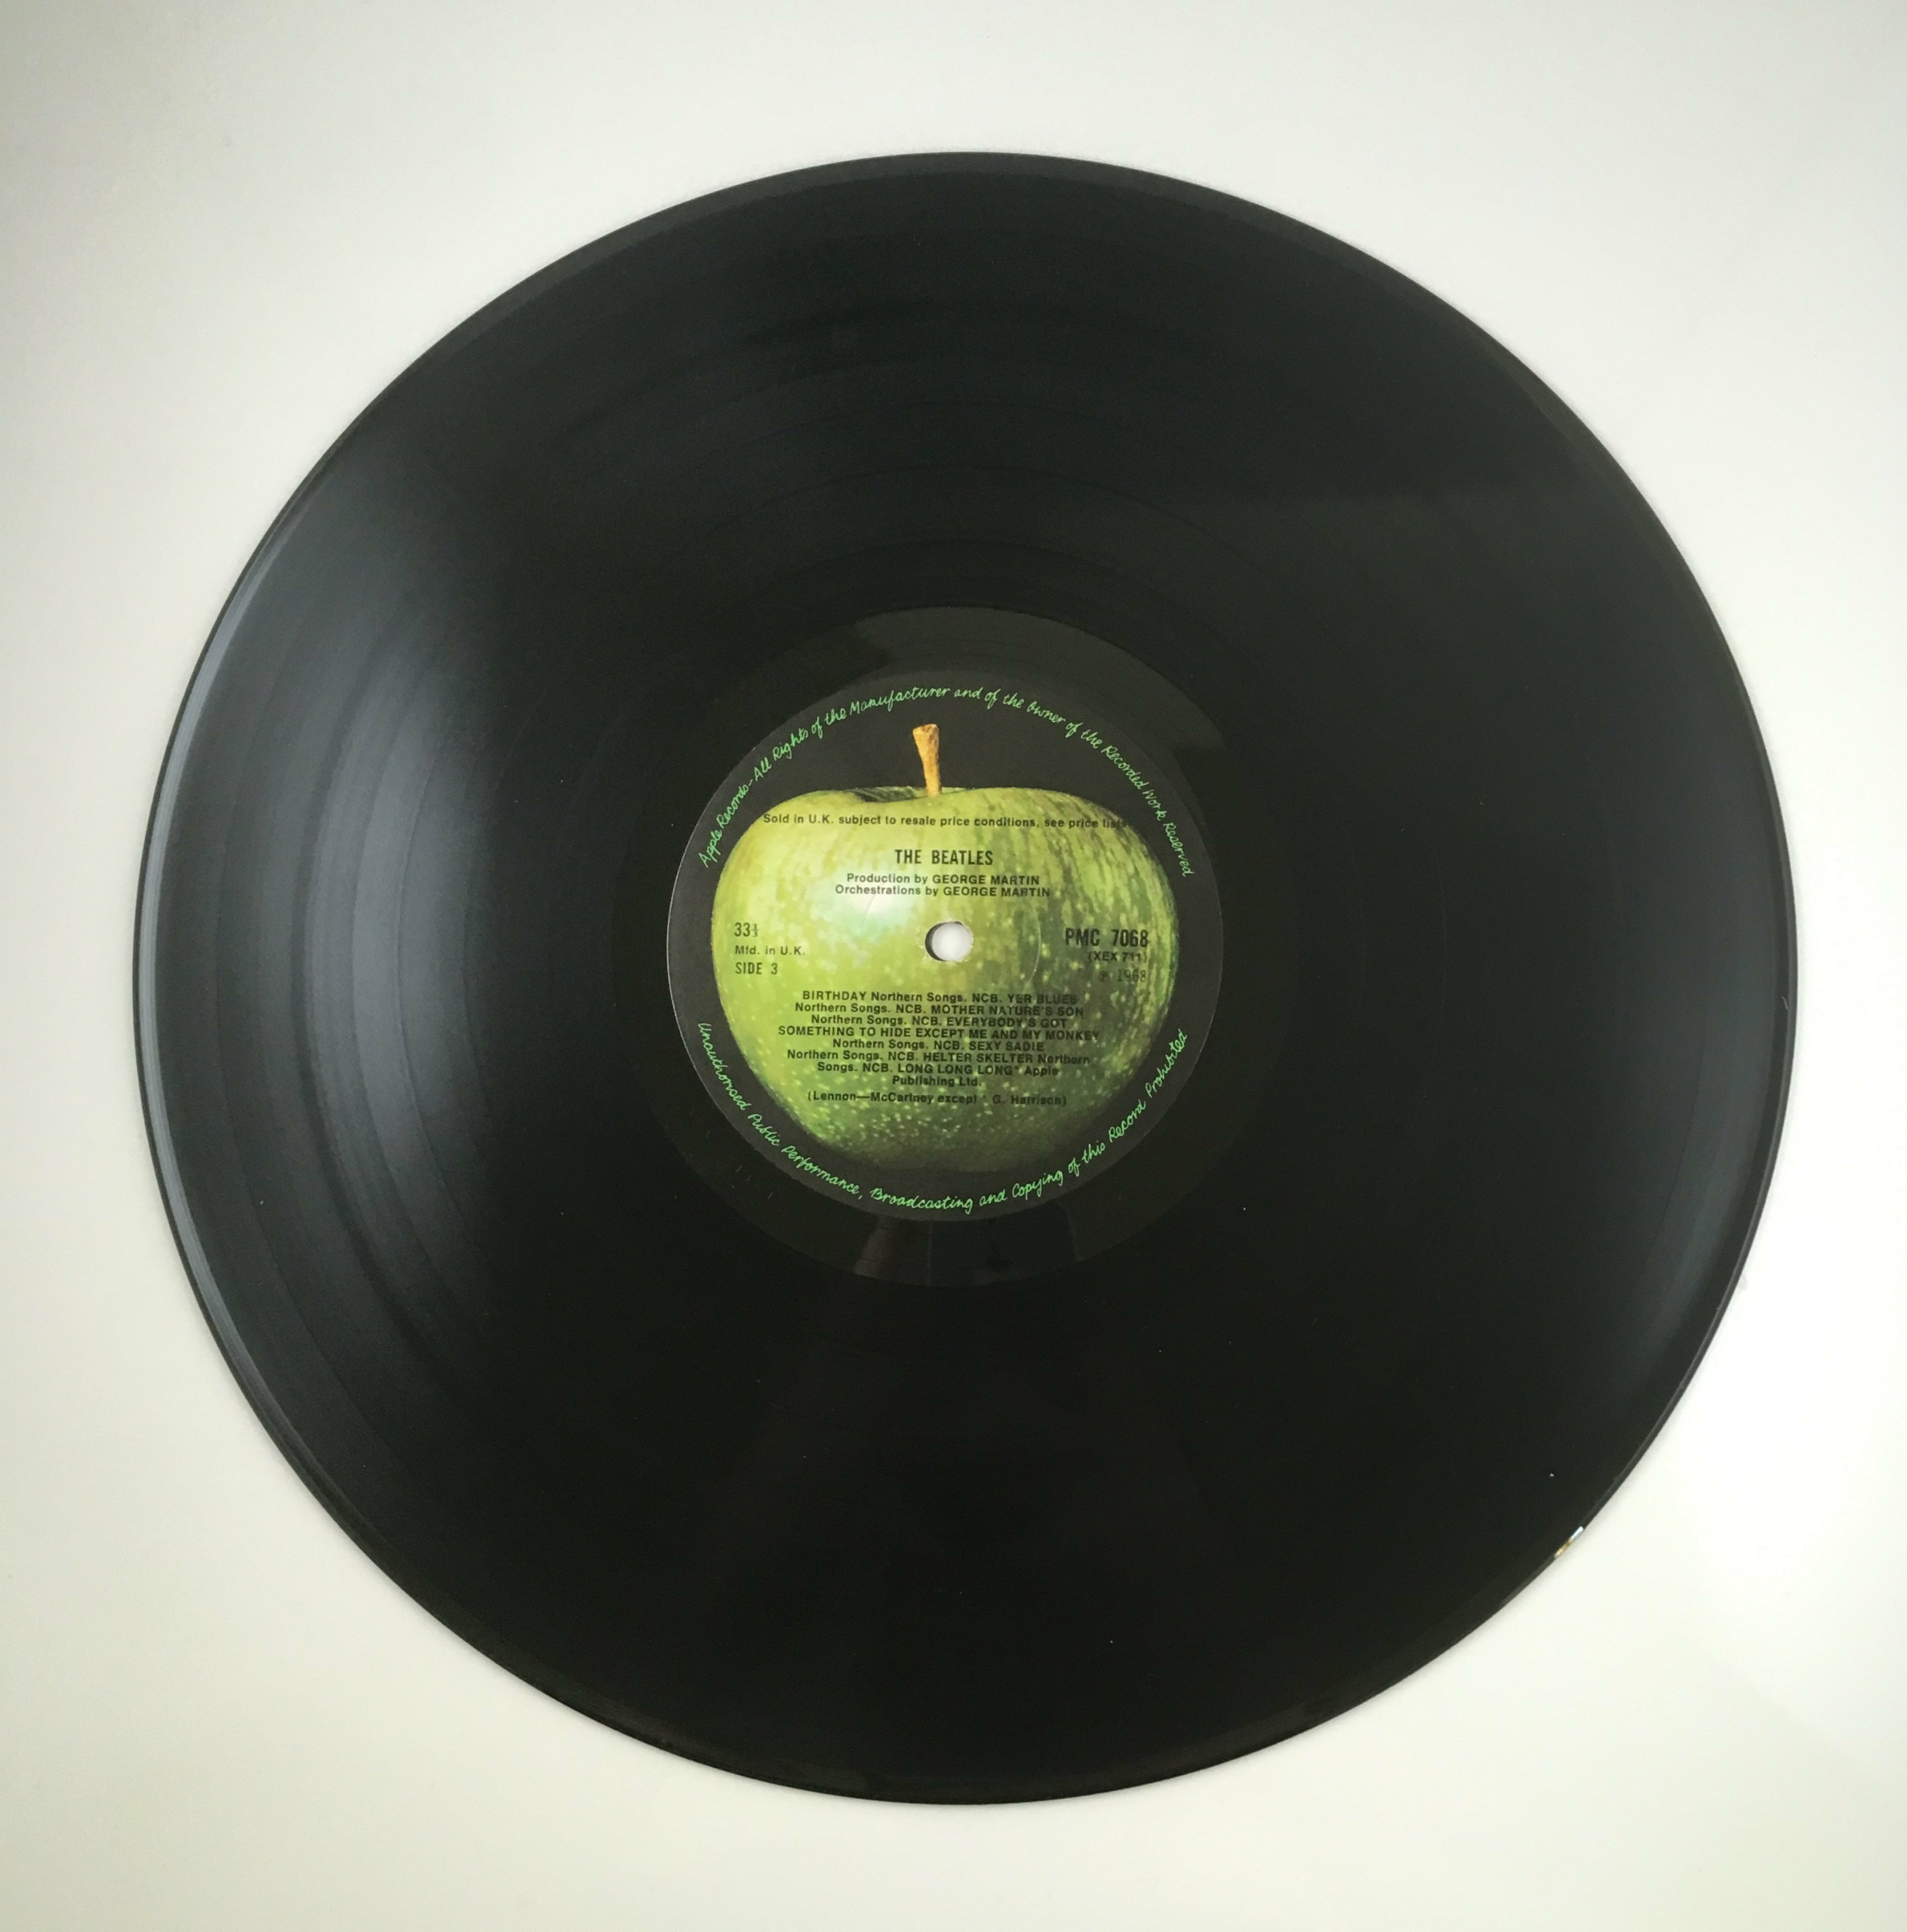 Original The Beatles White Album 0005096 Early Pressing